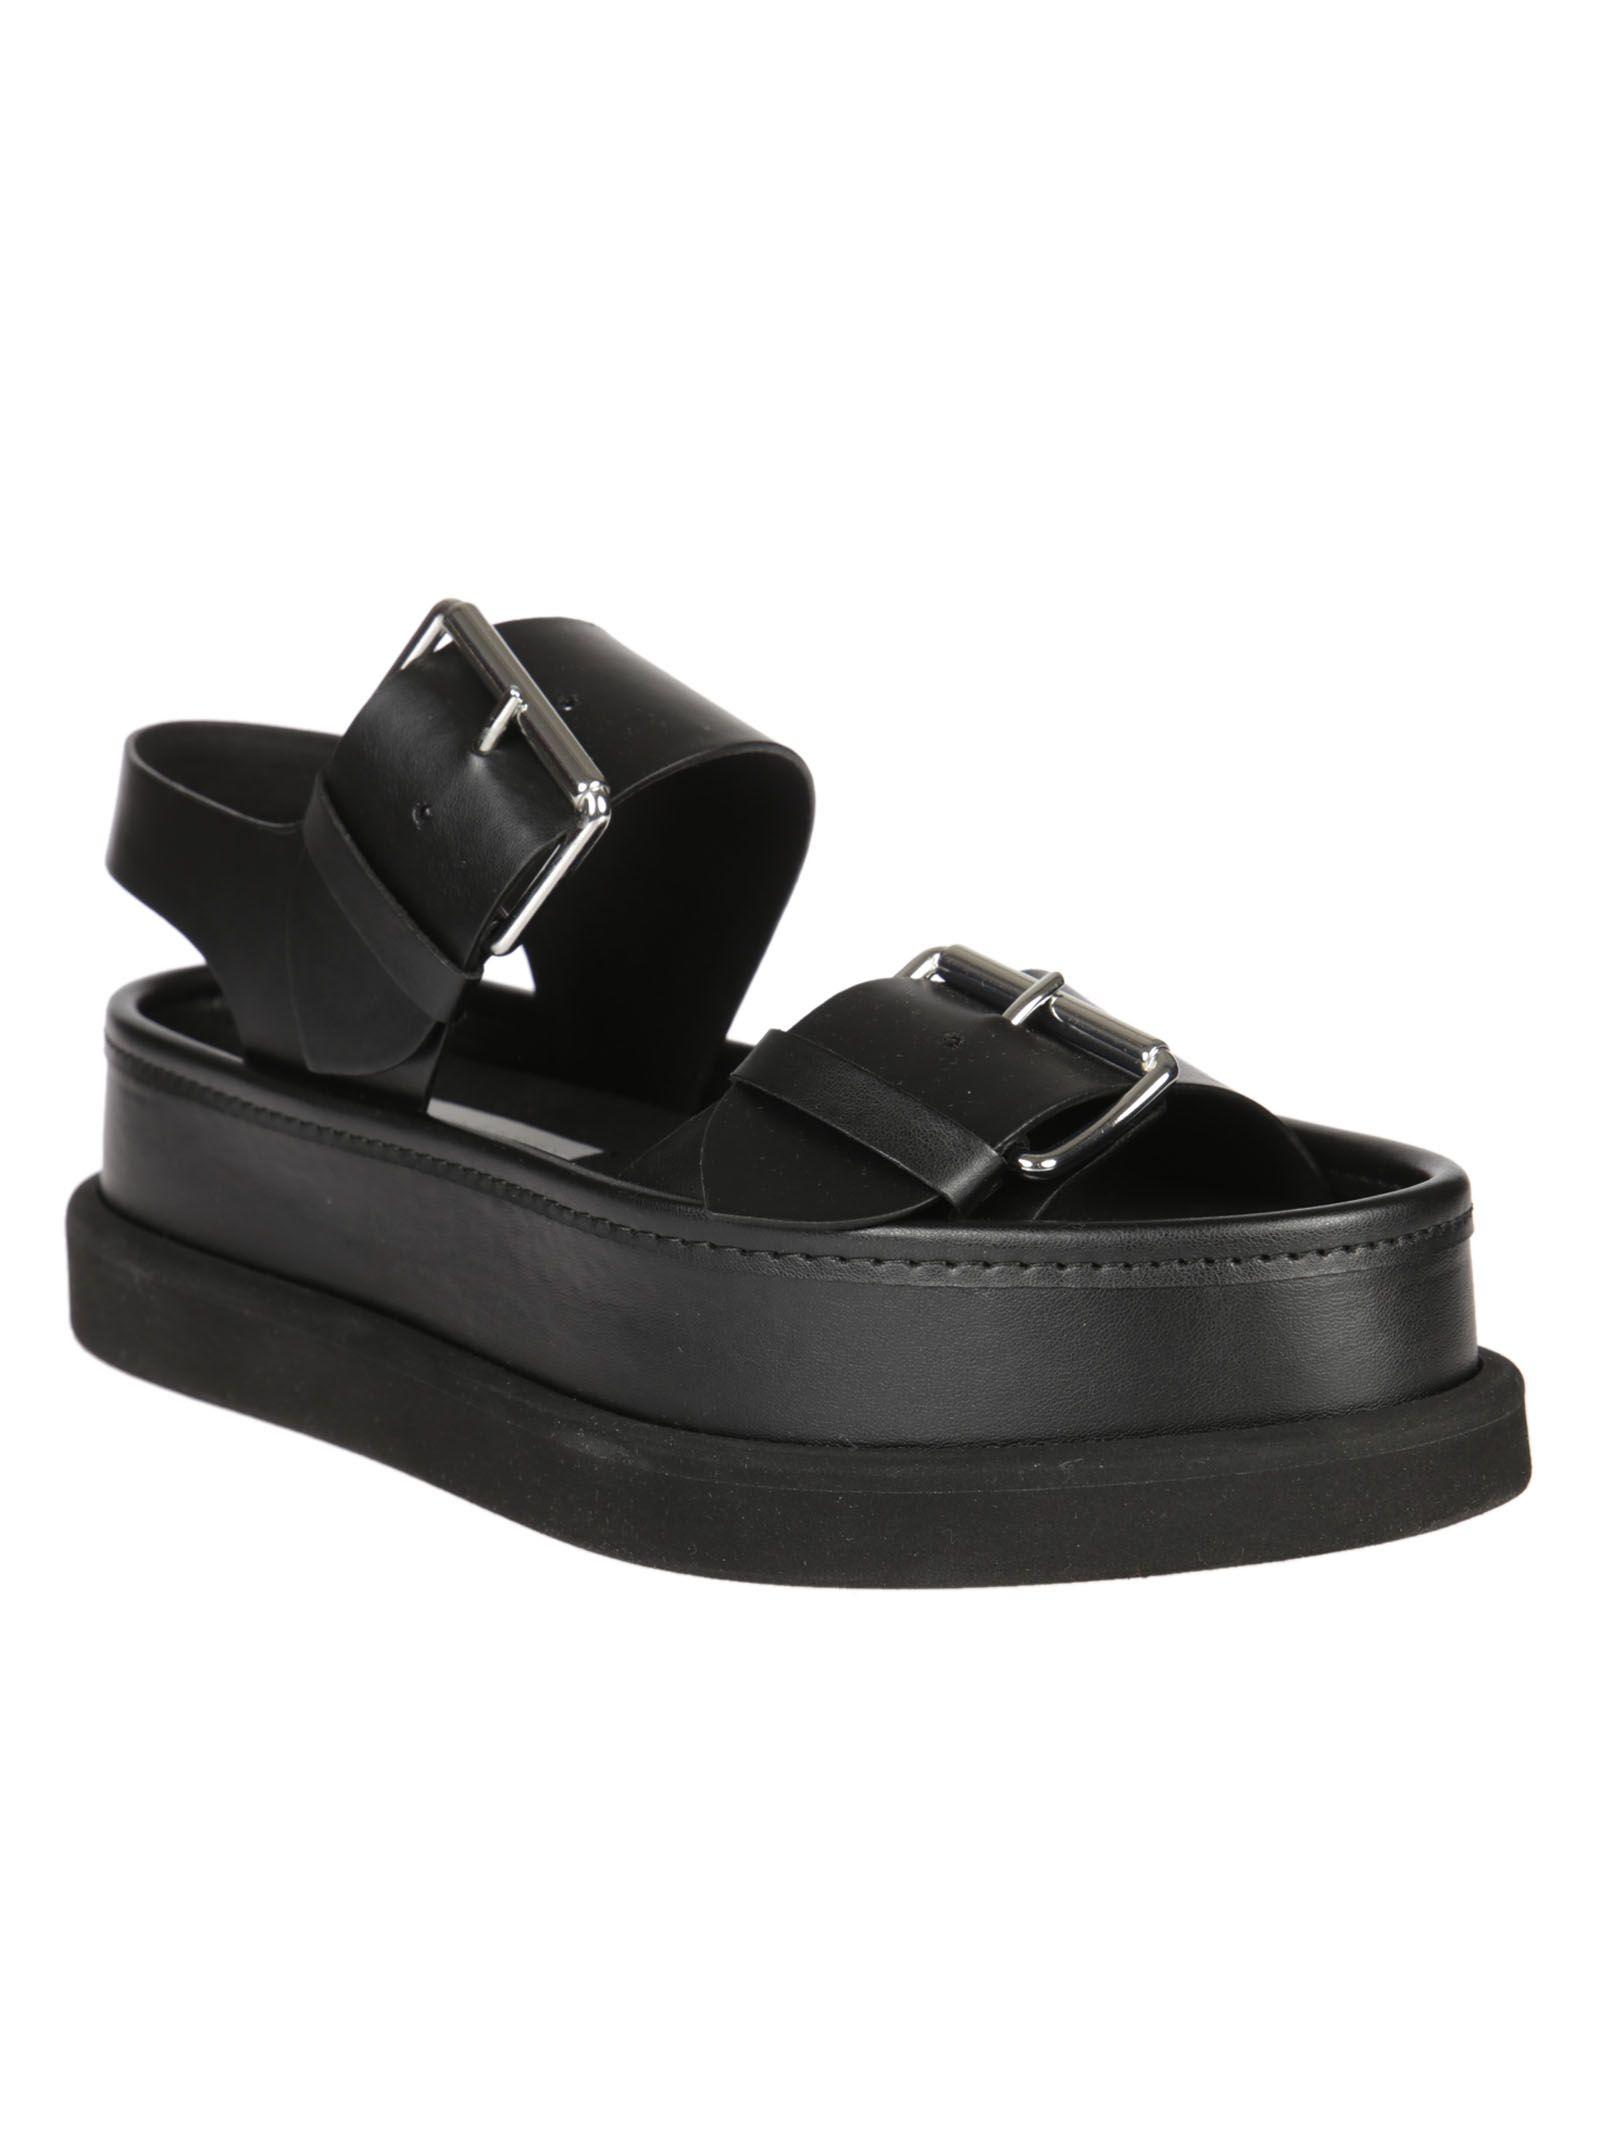 Stella McCartney Buckles sandals m6Q58ABS